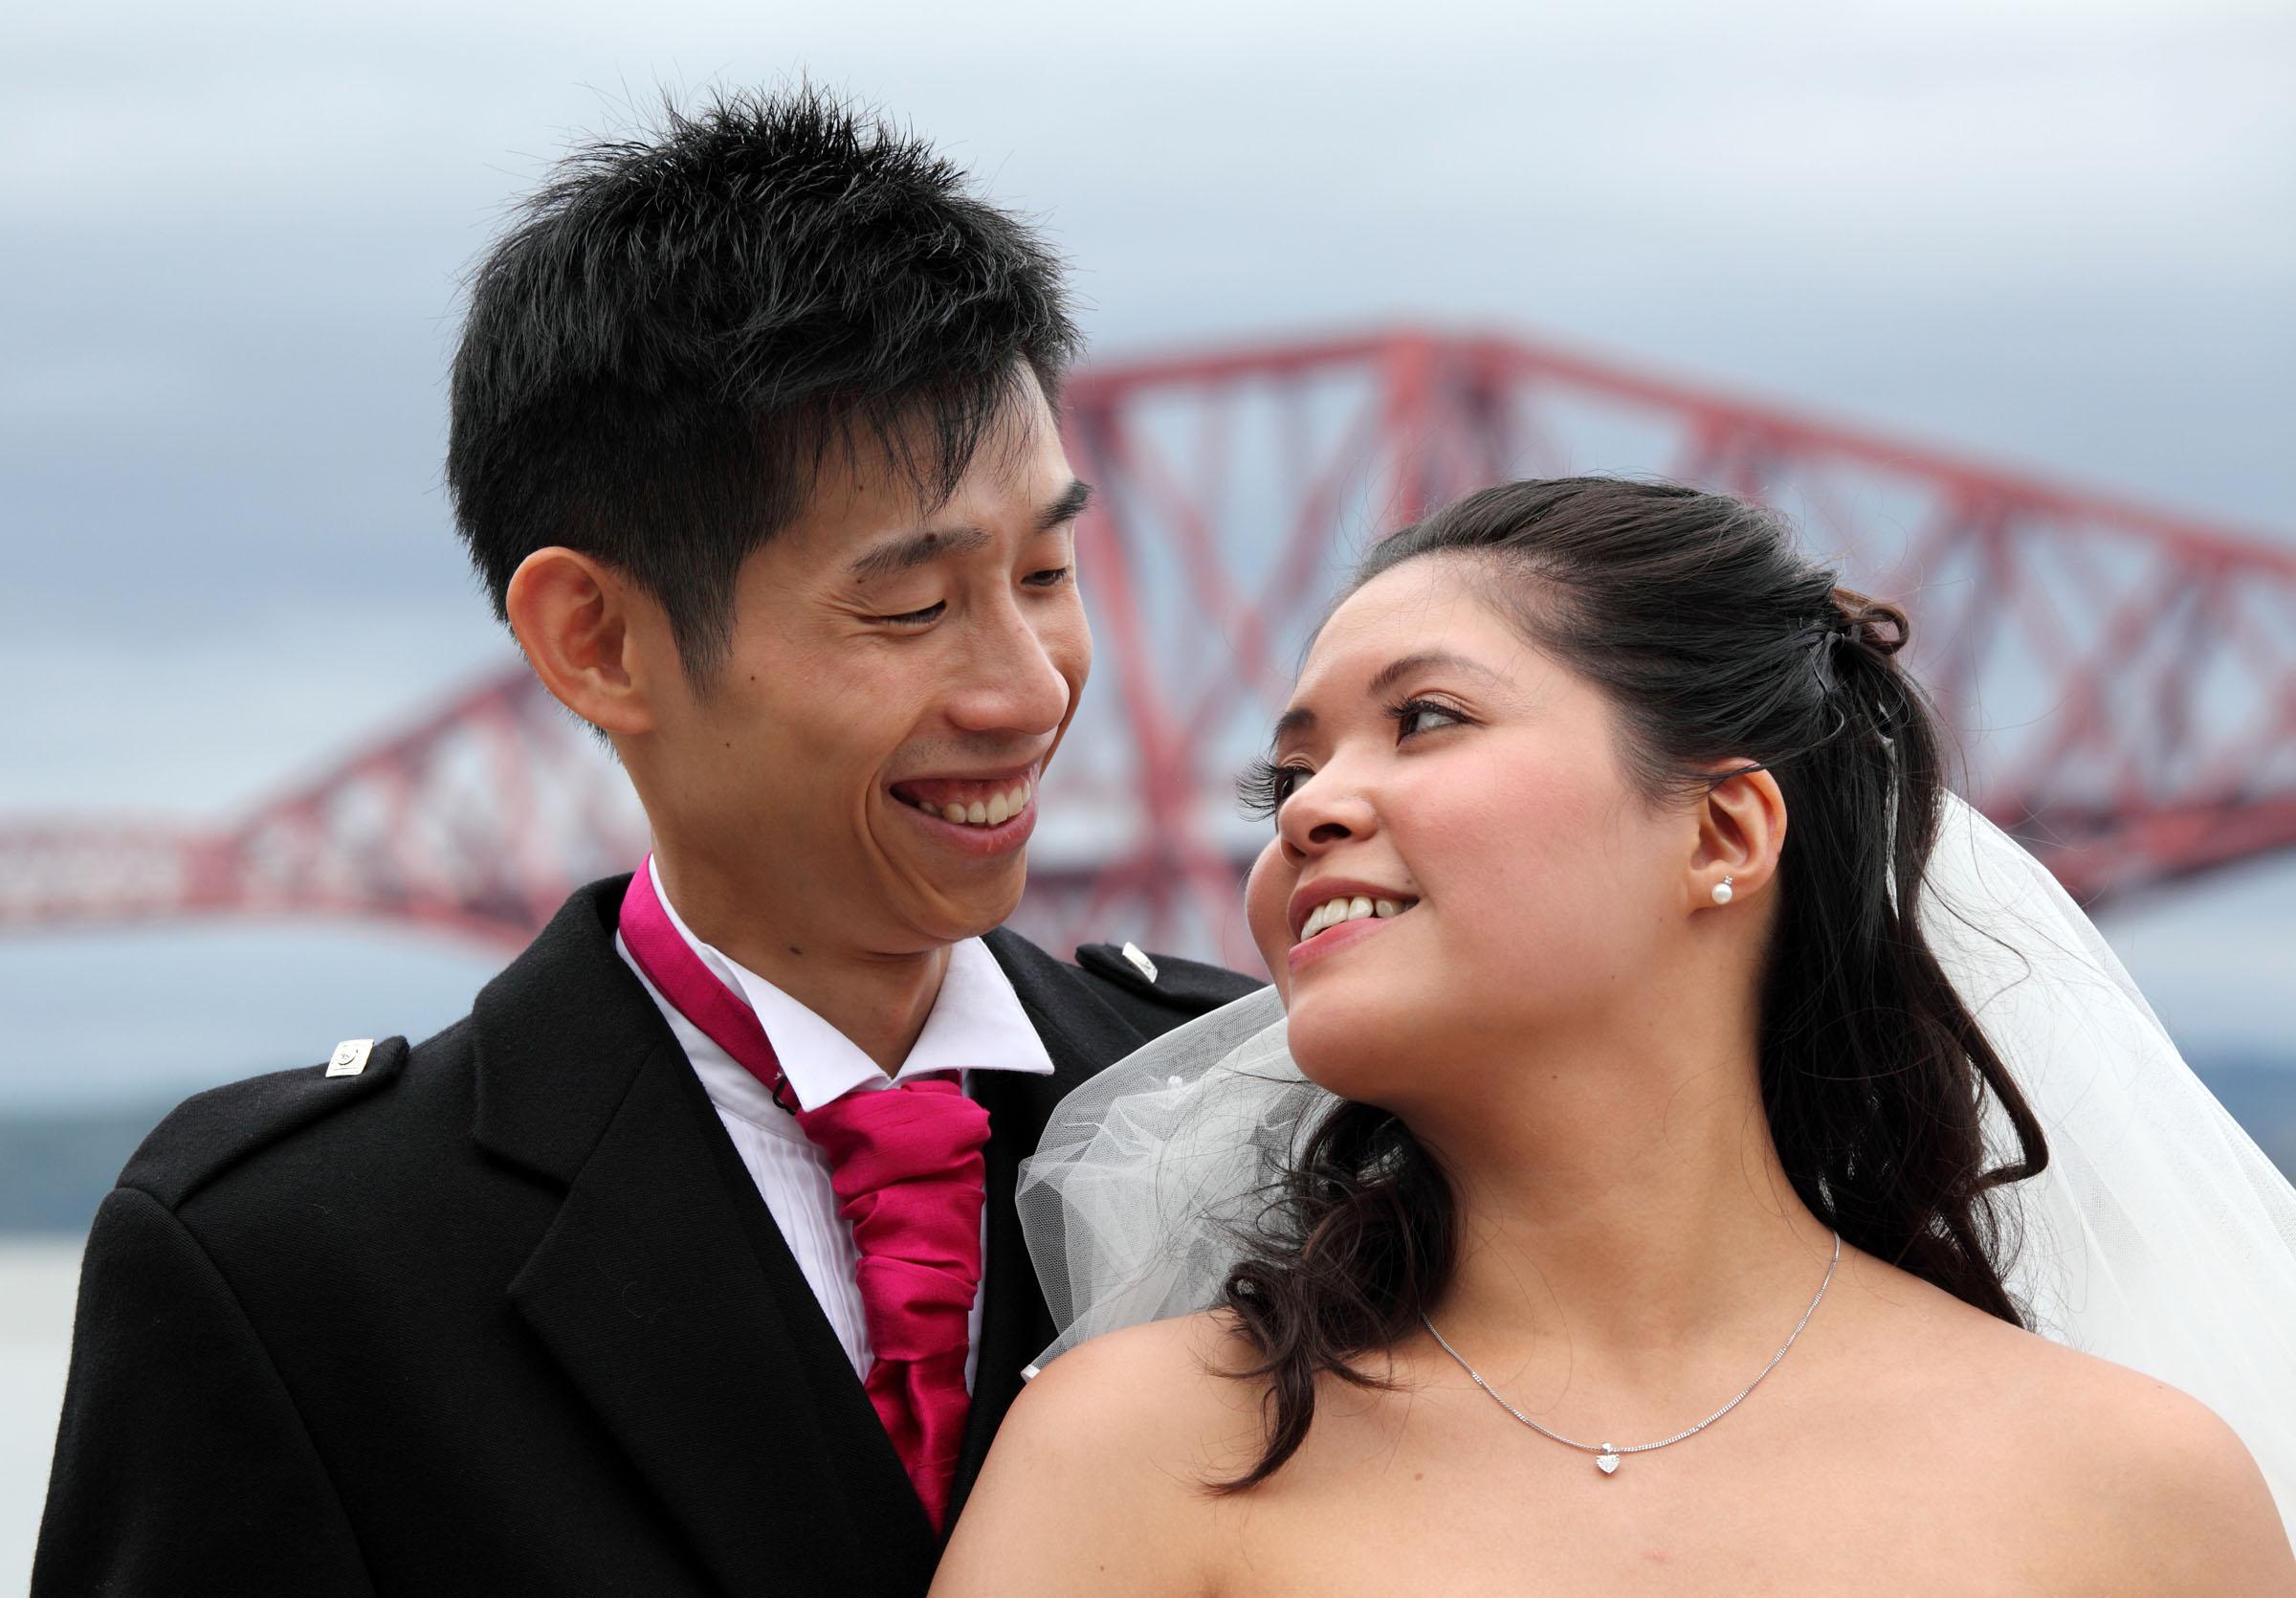 Bride&Groom_Bridges_wedding photography.jpg